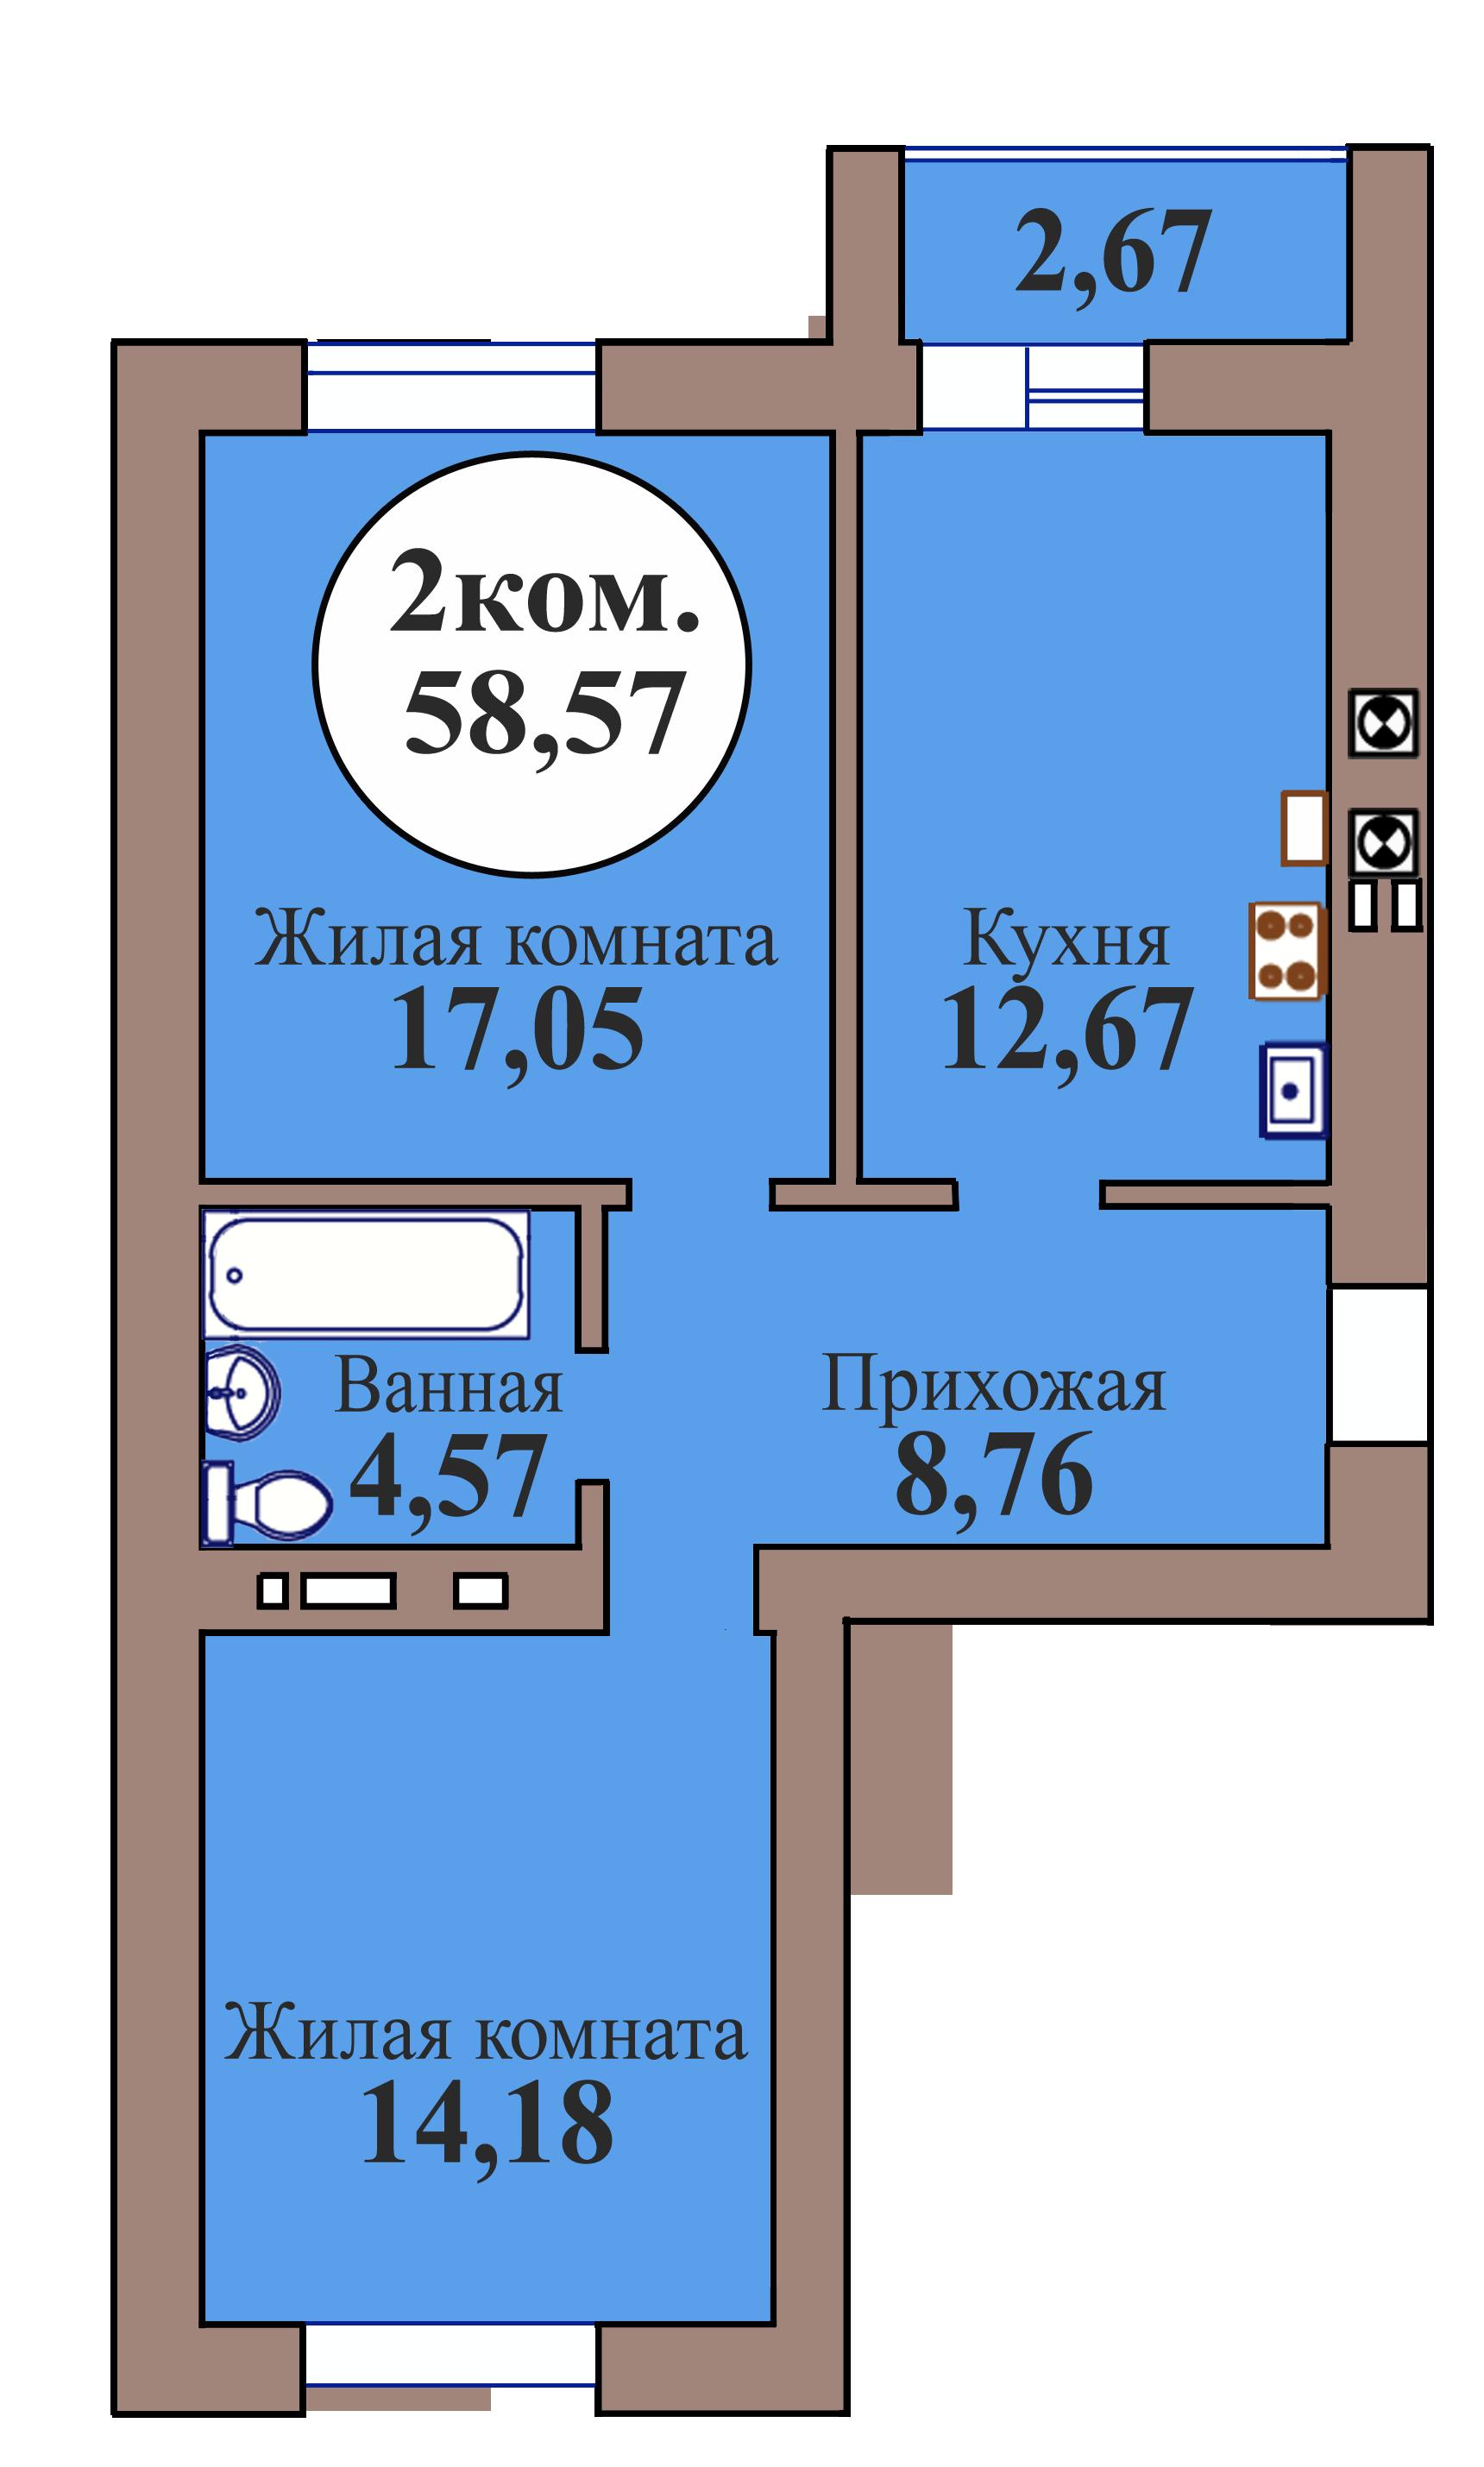 2-комн. кв. по пер. Калининградский, 5 кв. 109 в Калининграде